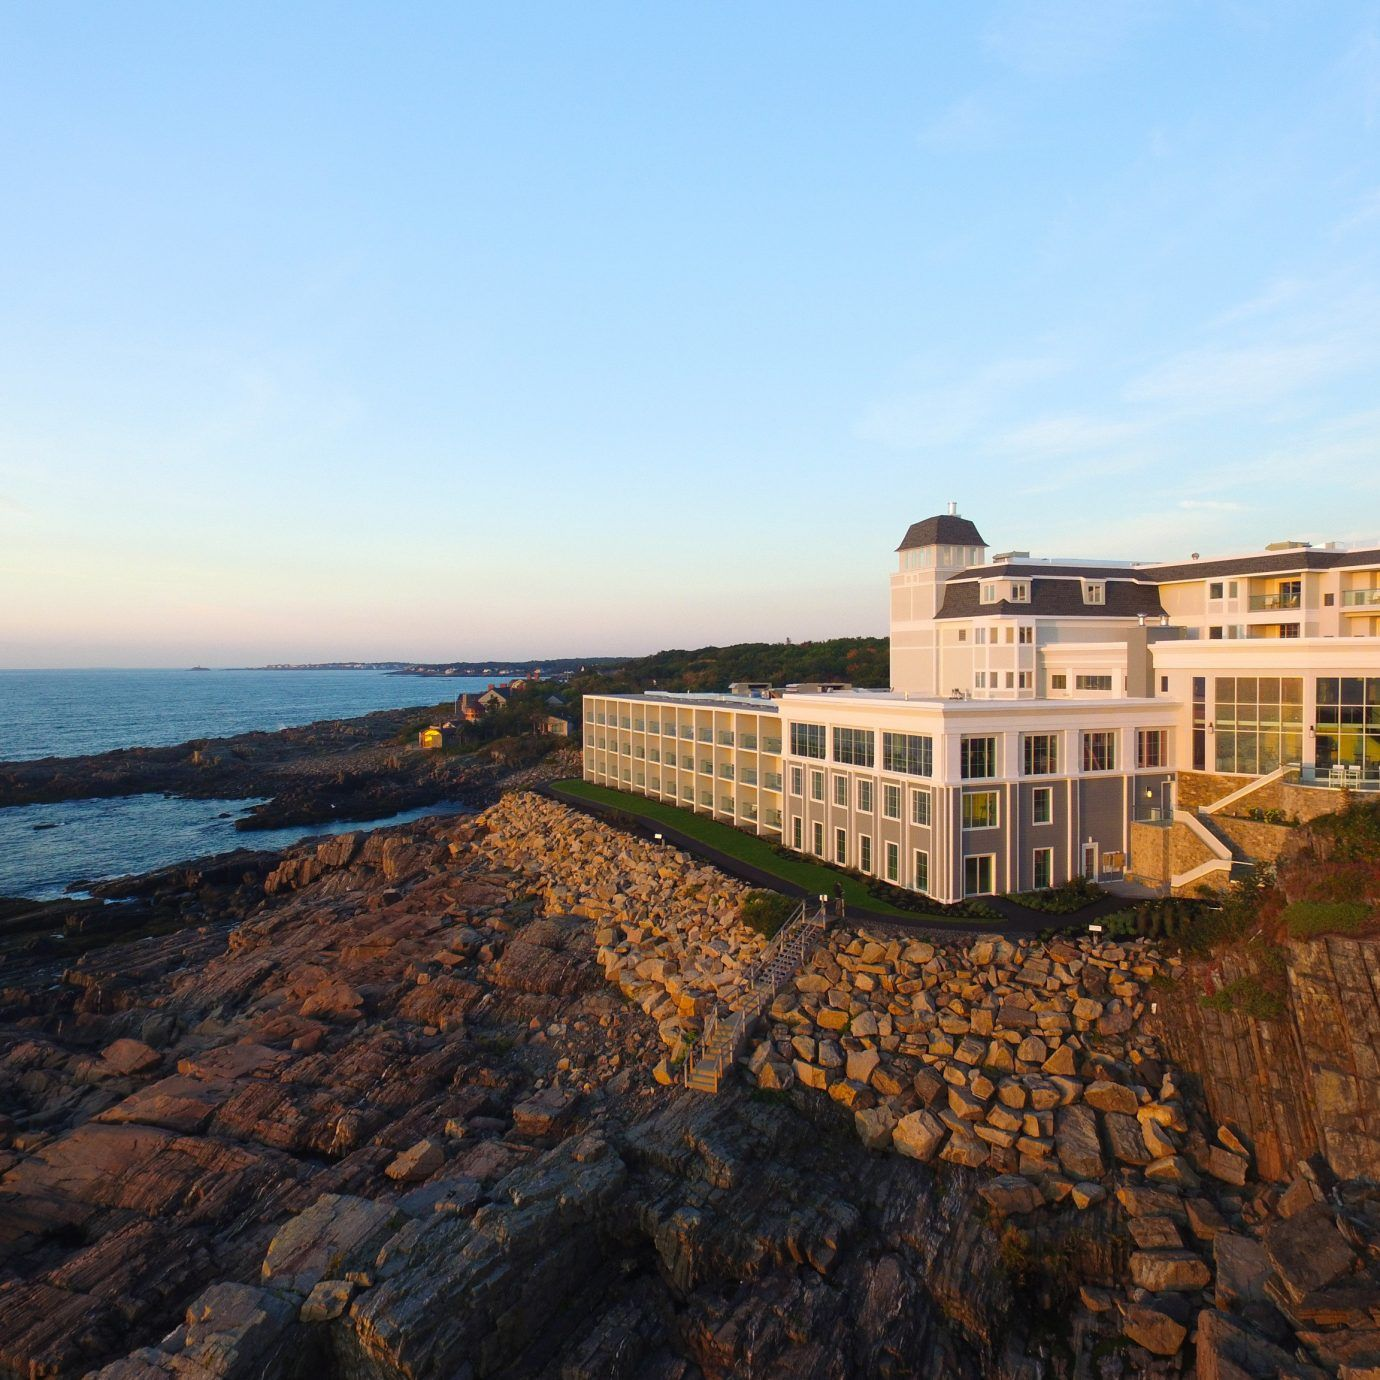 Cliff House Maine Cape Neddick Me Family Resort Vacations